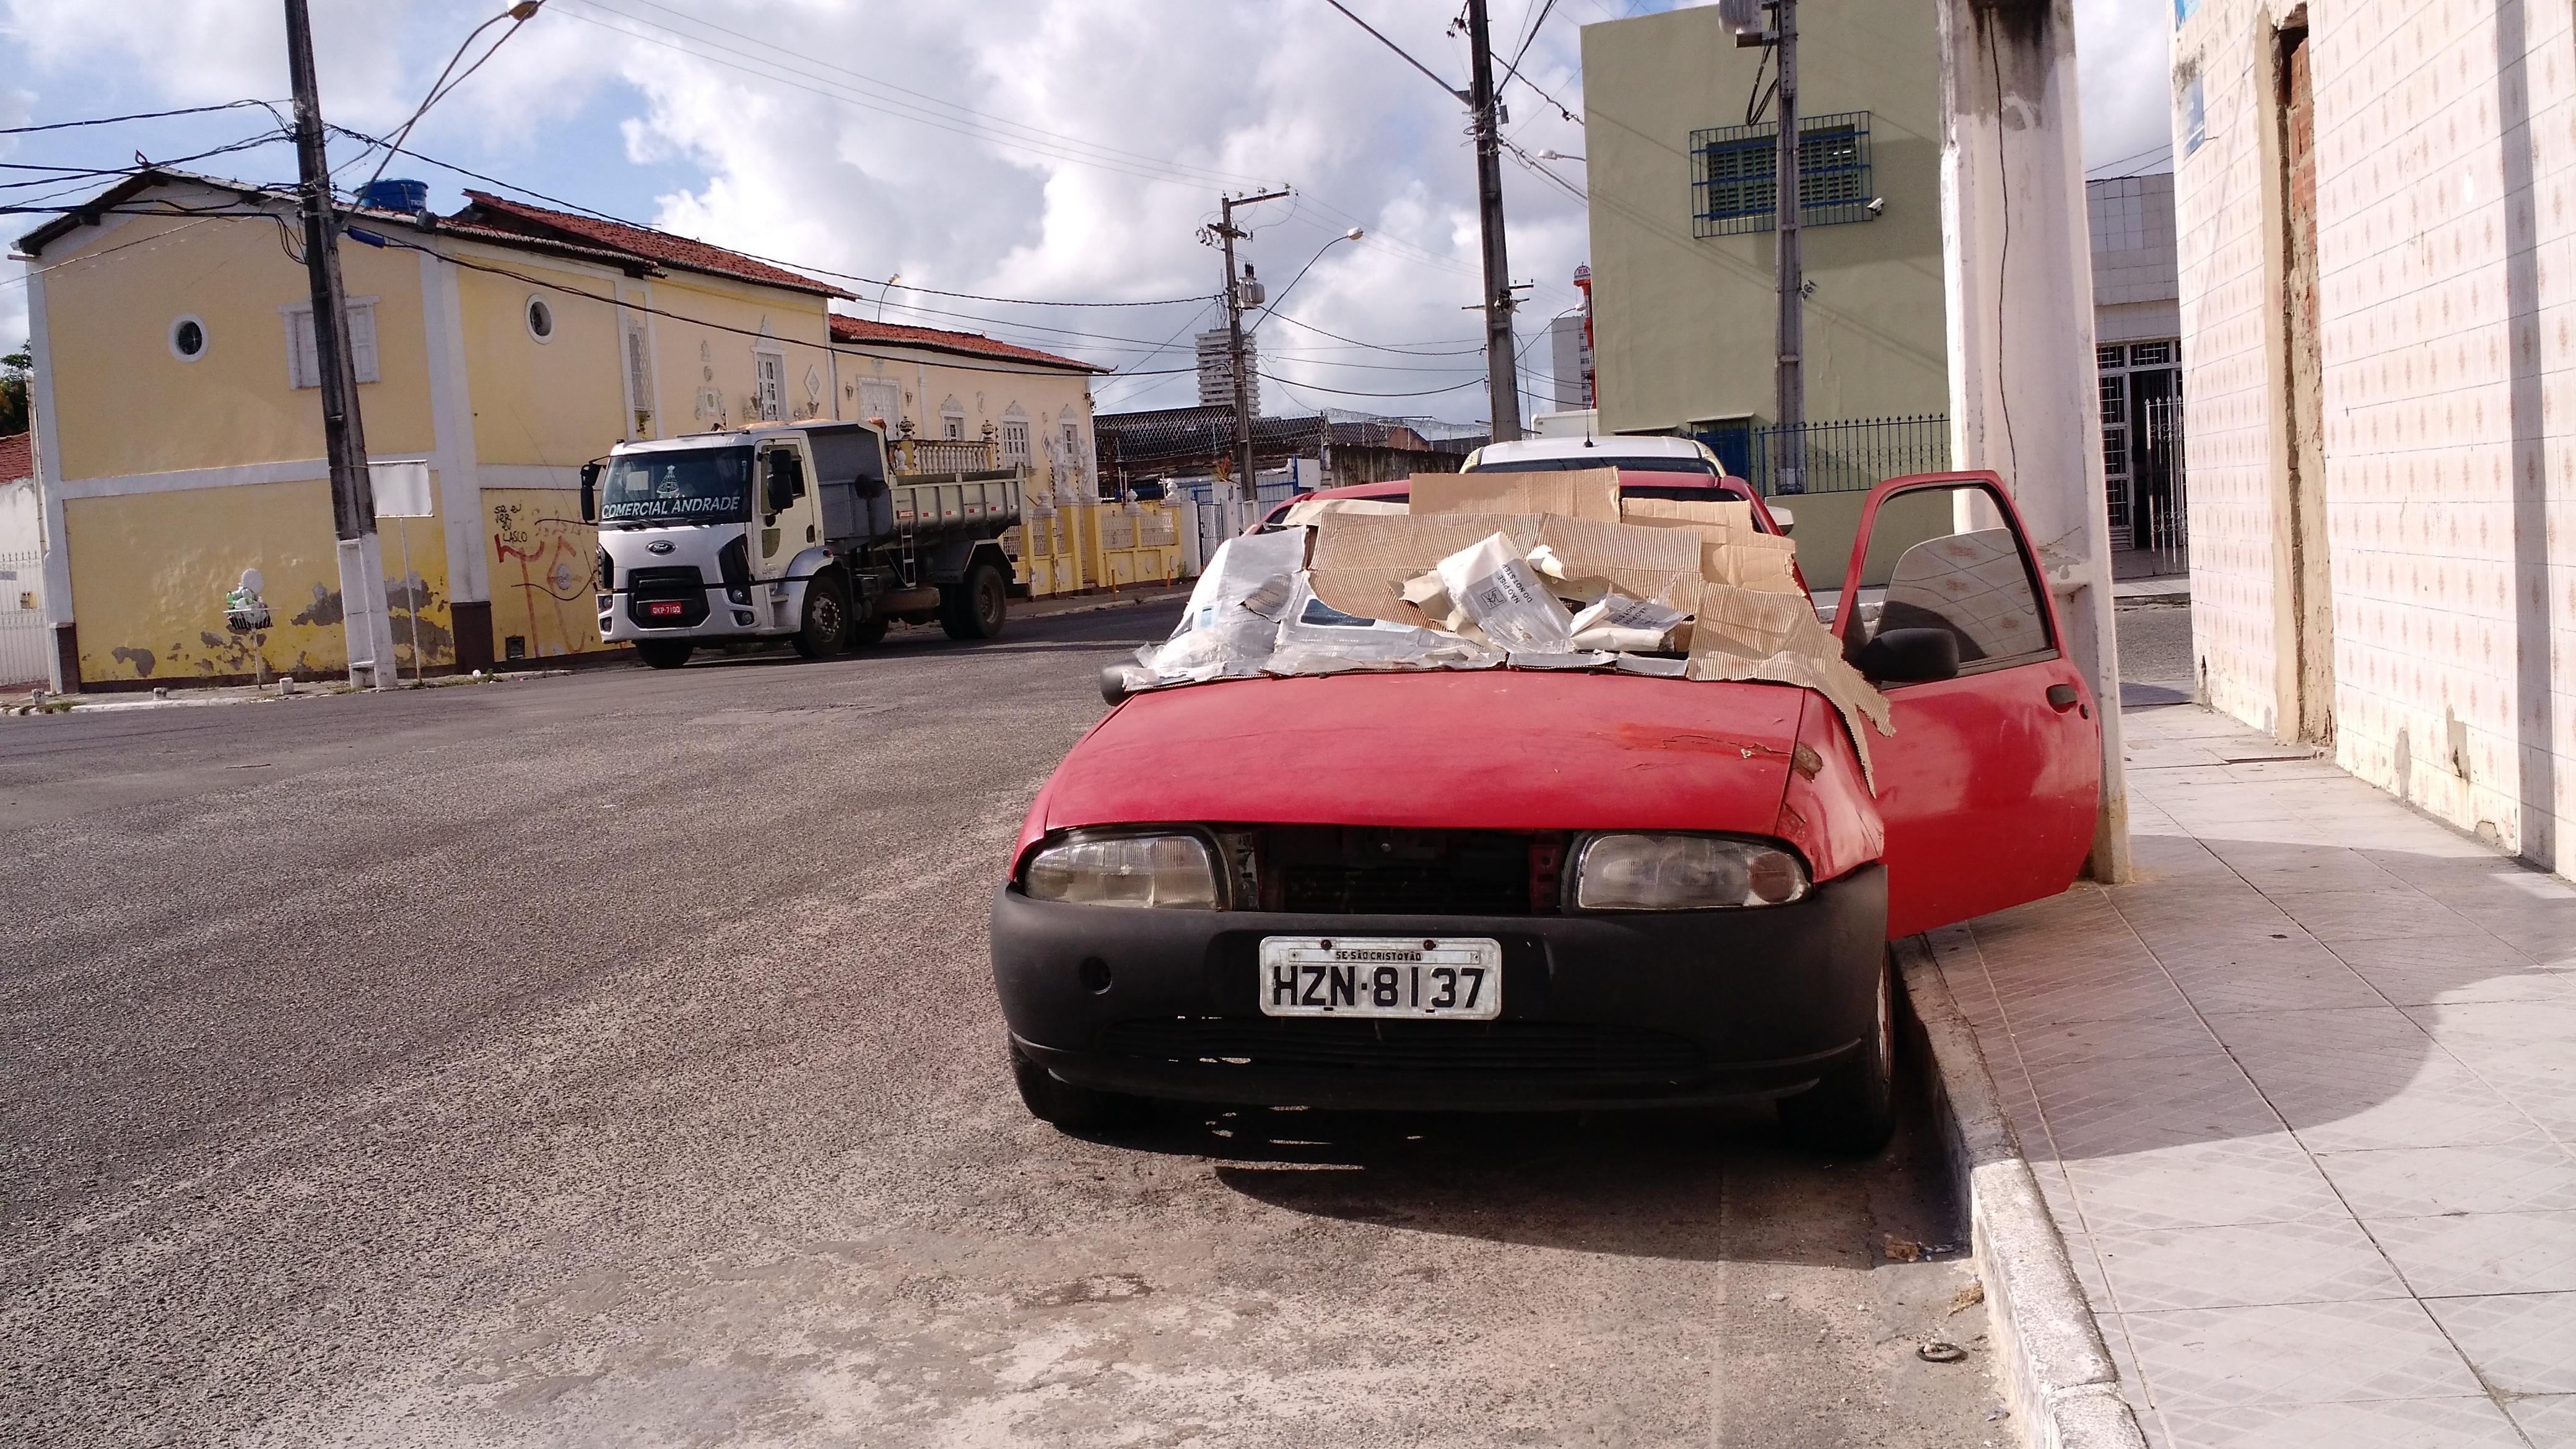 Moradores do Bairro Industrial pedem ajuda para o idoso que mora dentro de carro